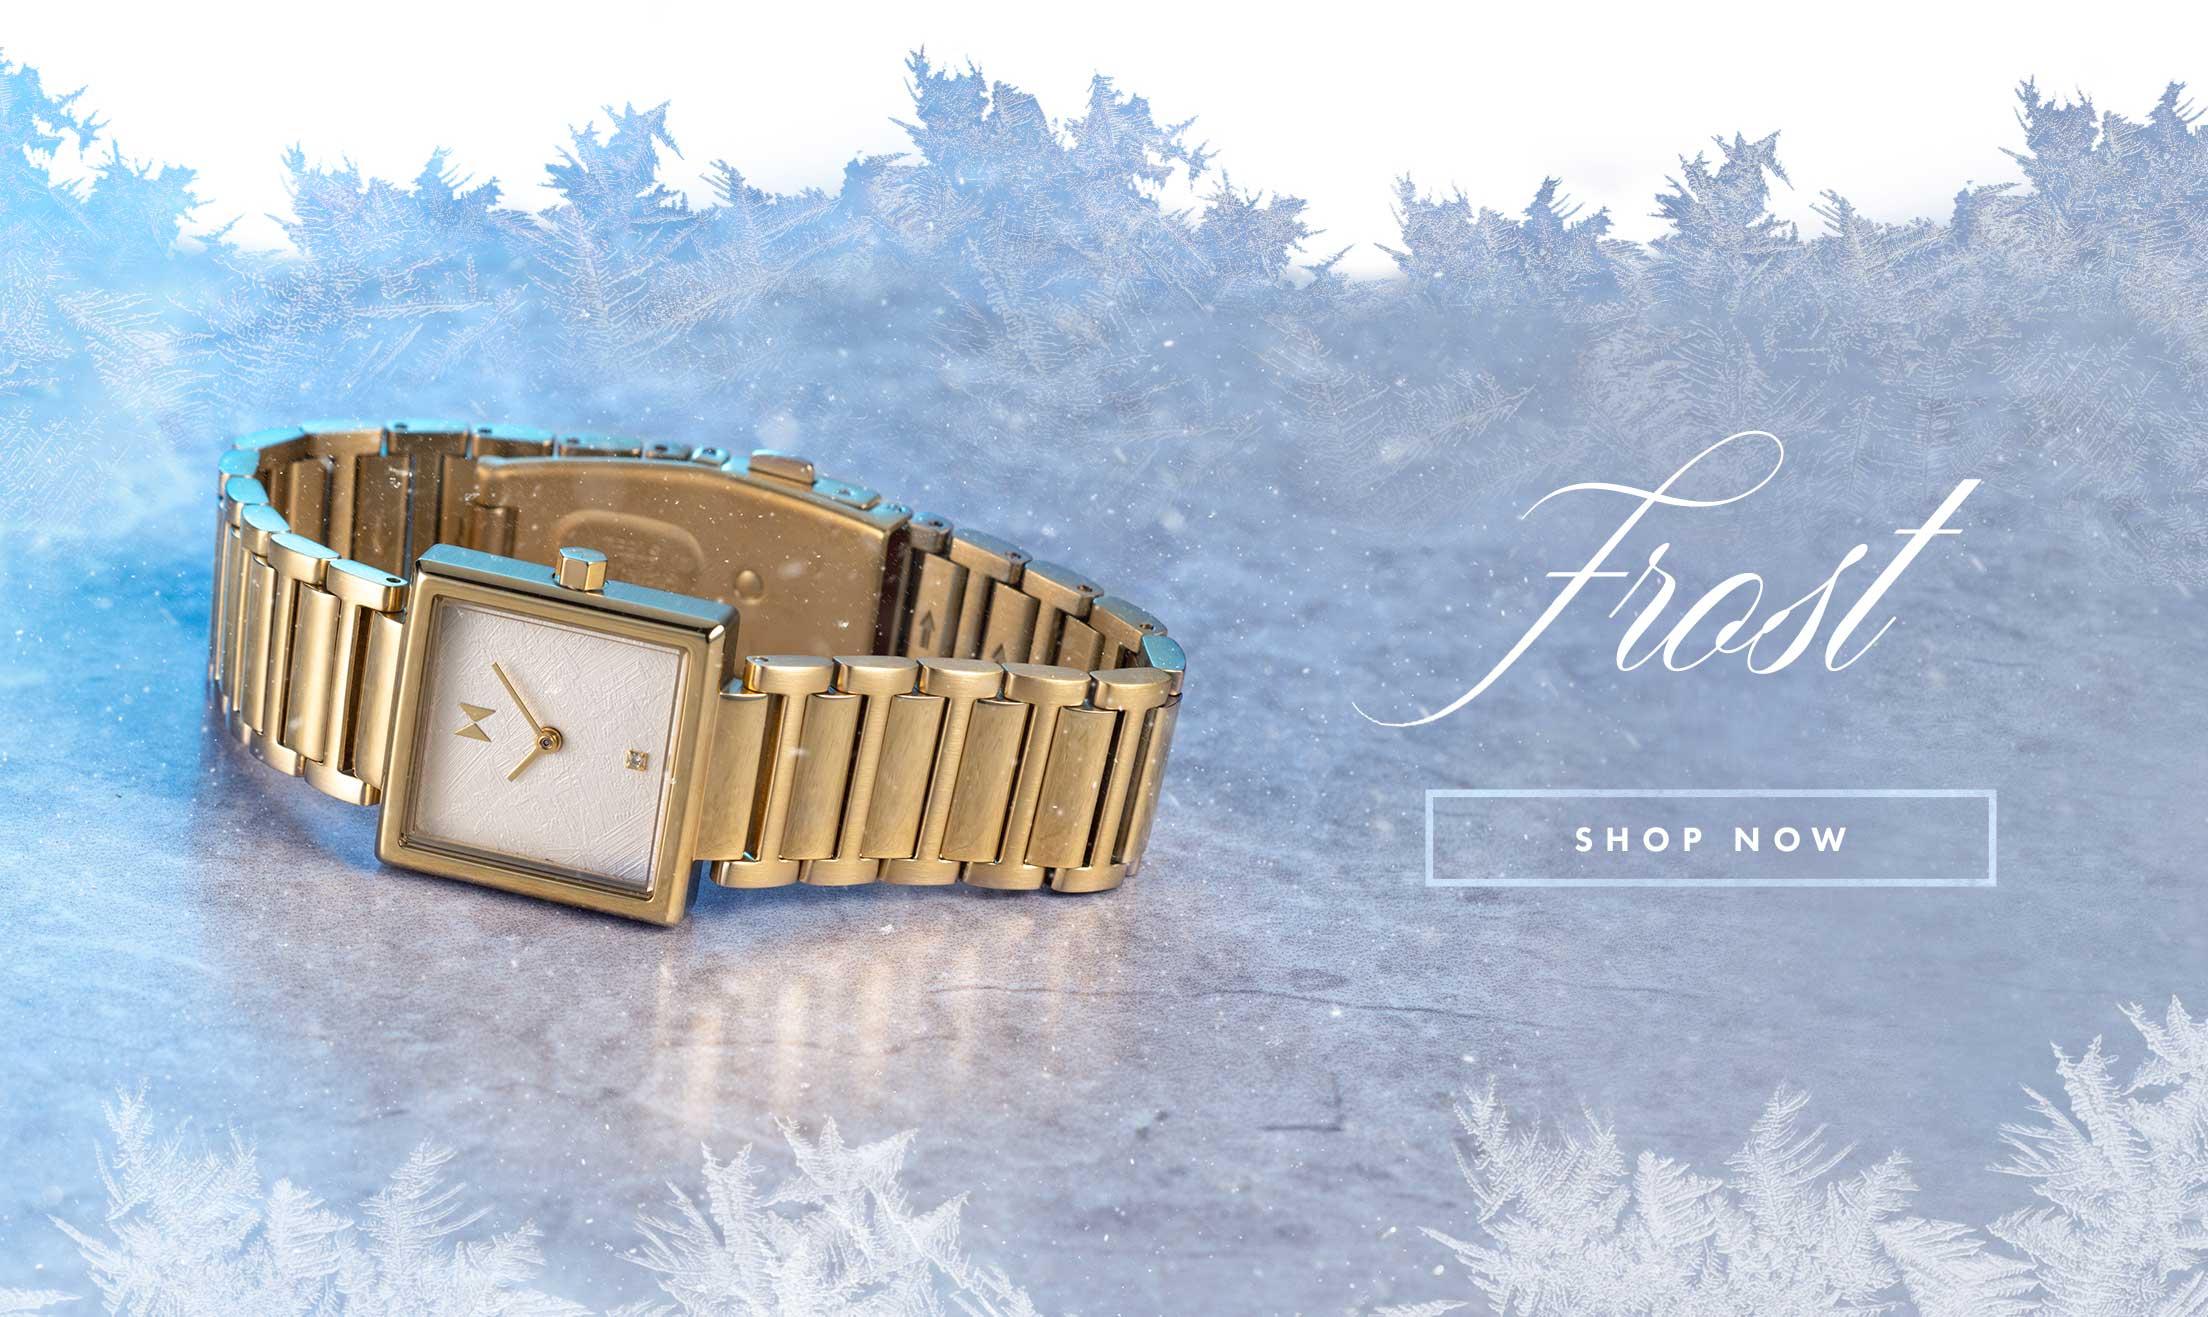 Frost Shop Now